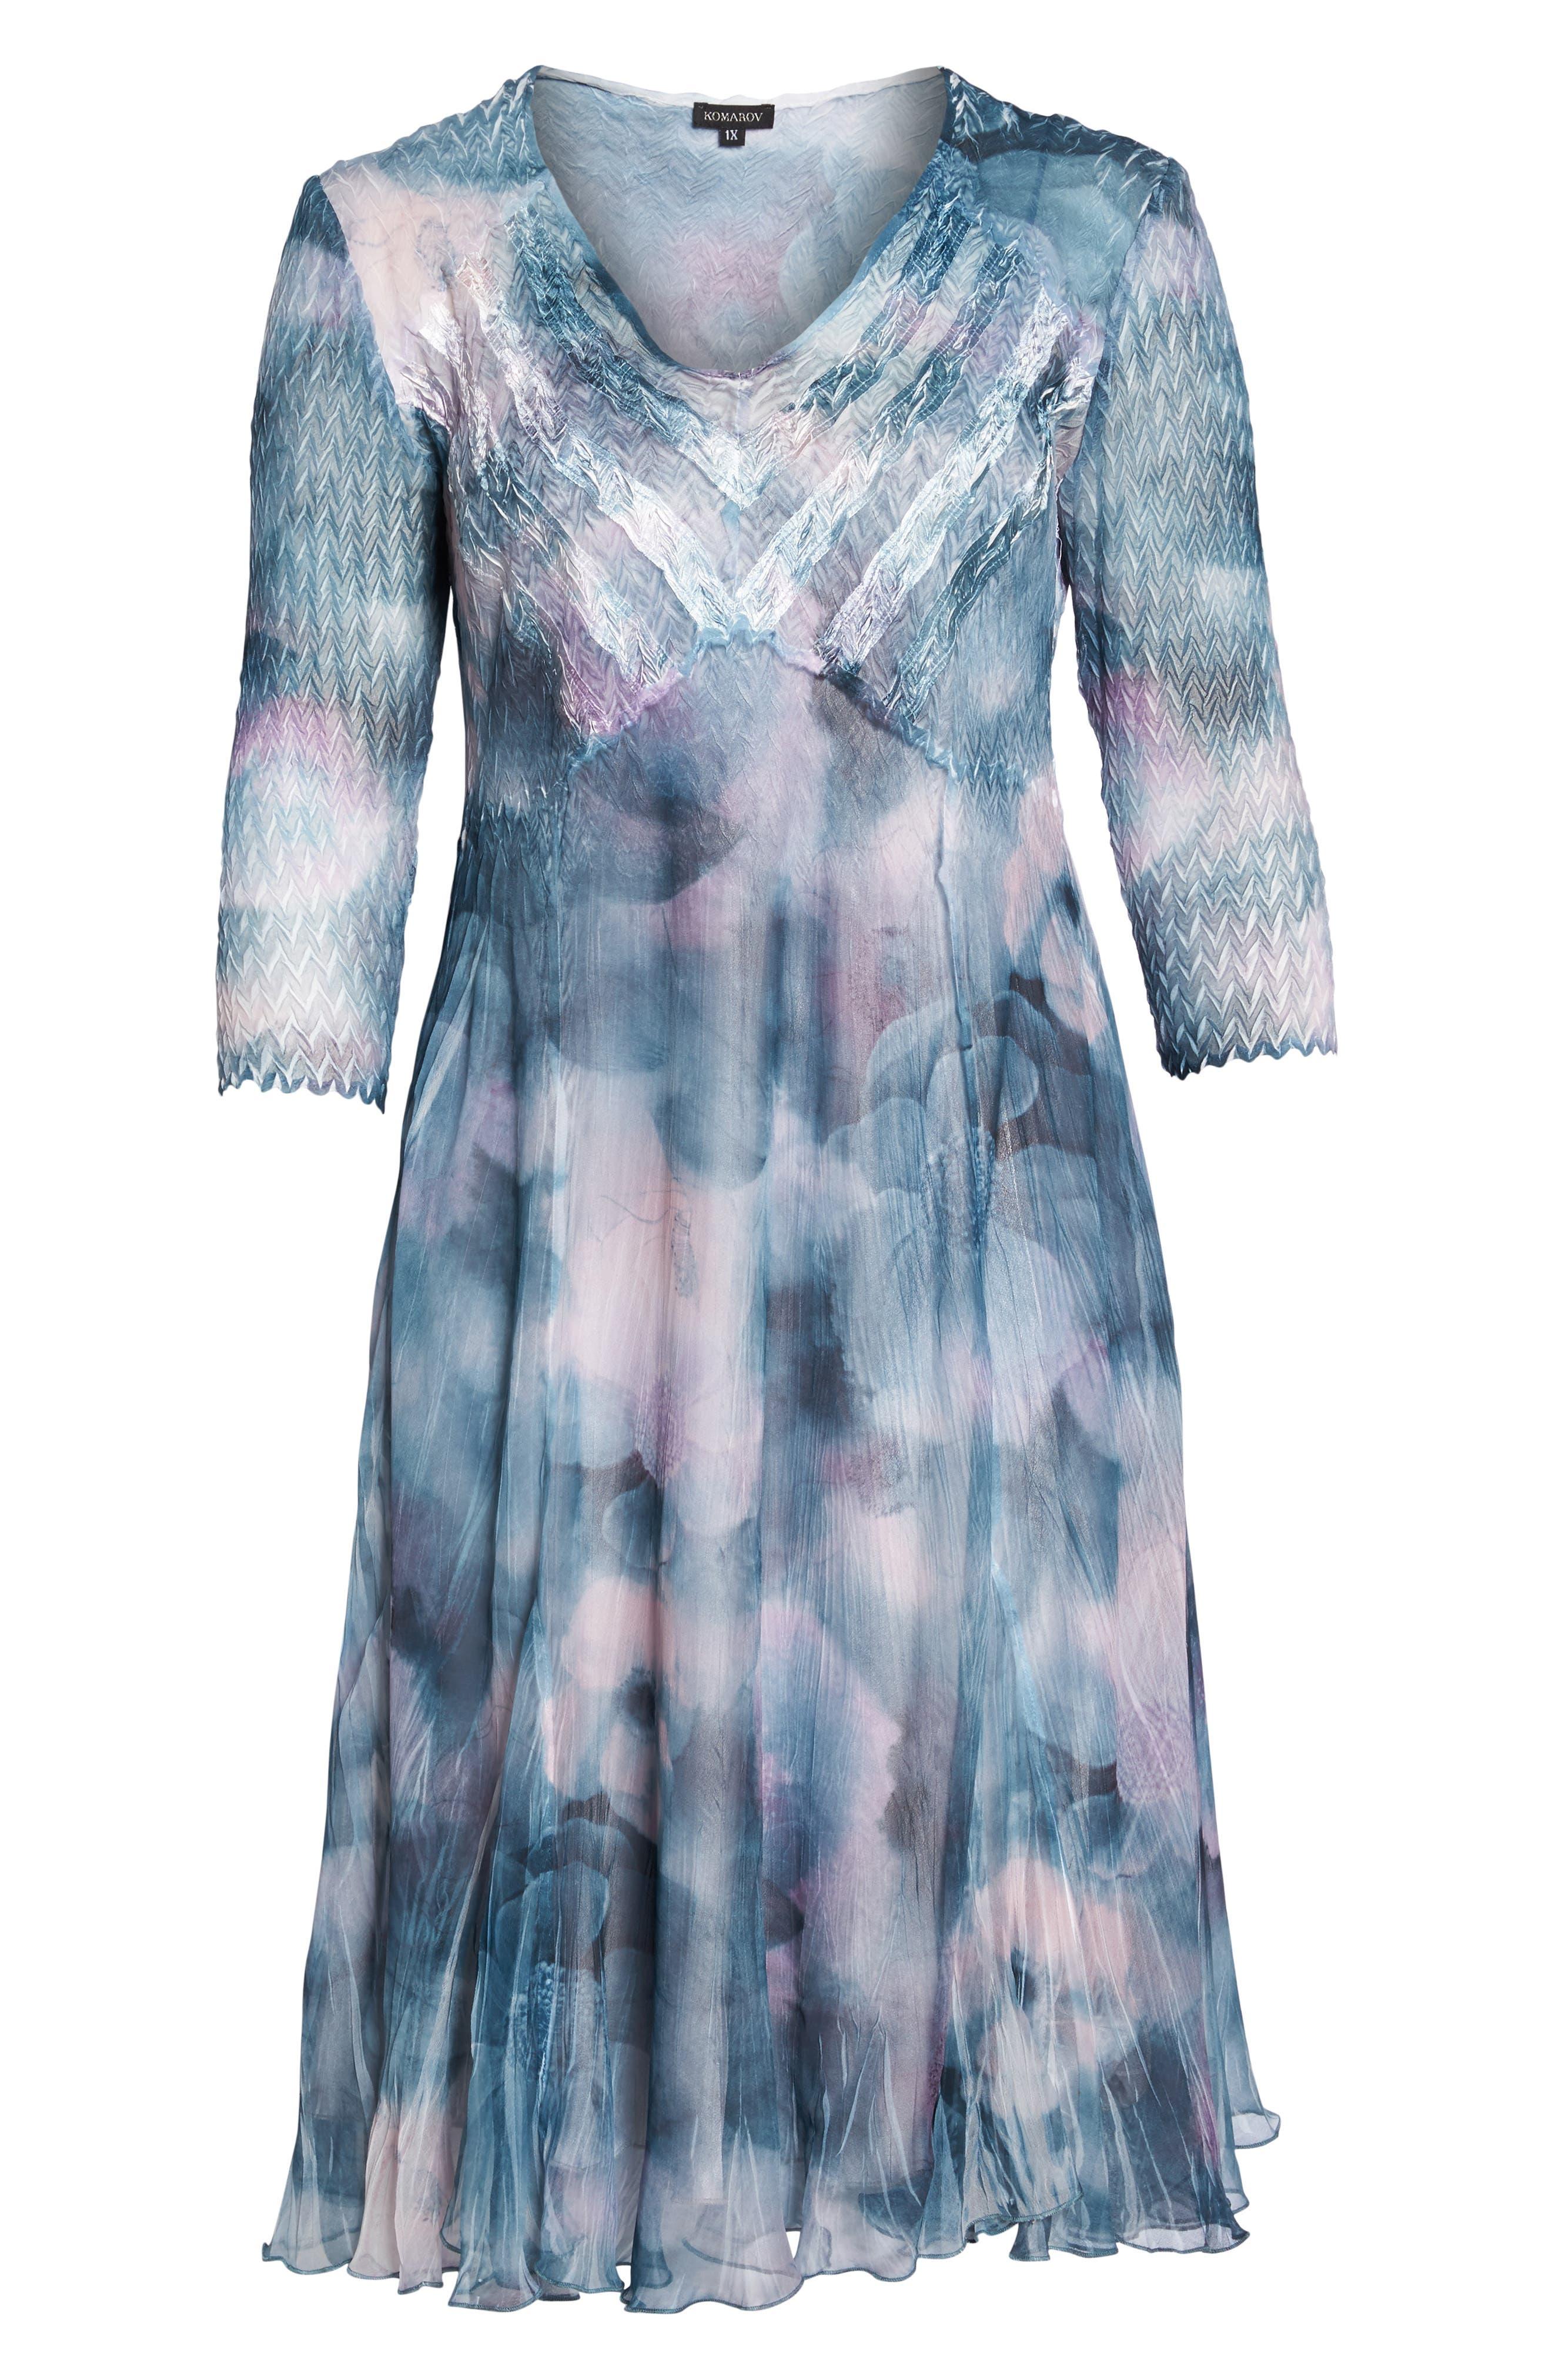 Floral Charmeuse & Chiffon A-Line Dress,                             Alternate thumbnail 6, color,                             Everglade Sky